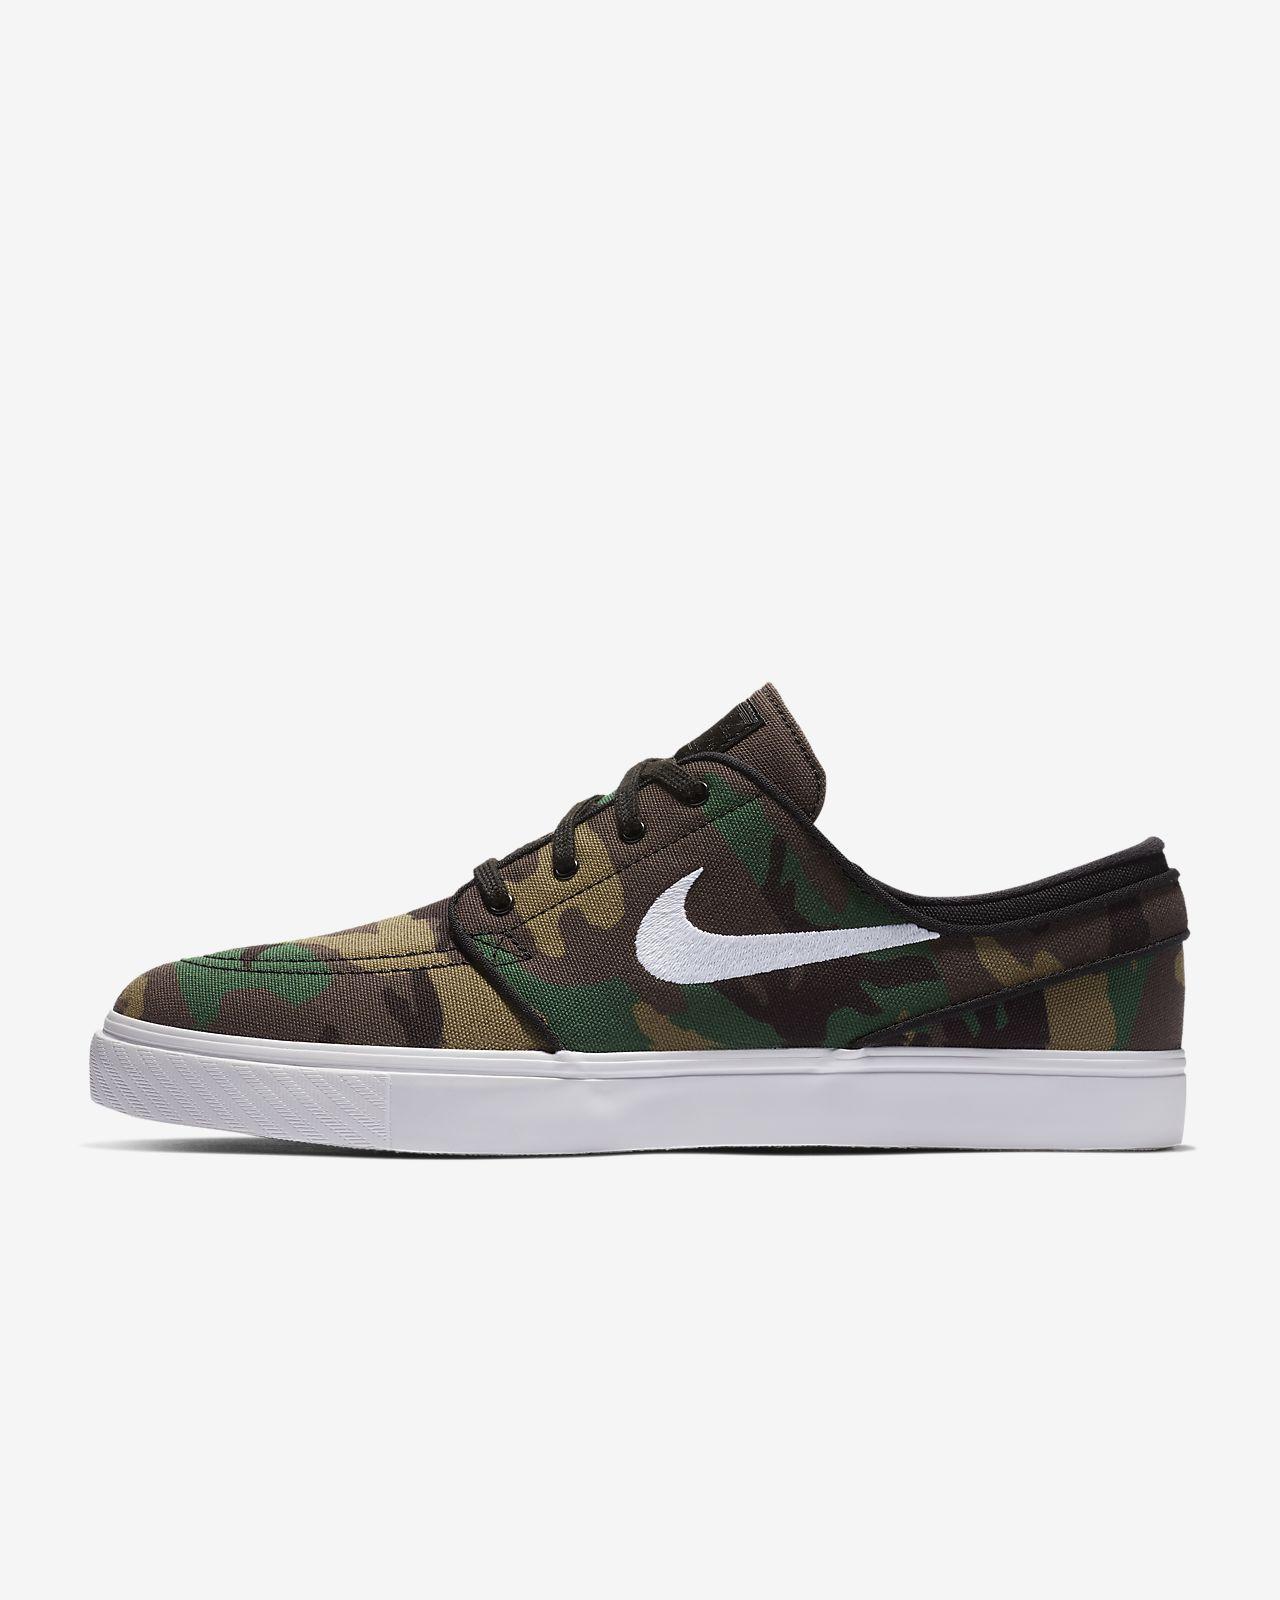 promo code 087e0 0c50c ... Nike SB Zoom Stefan Janoski Canvas Zapatillas de skateboard - Hombre